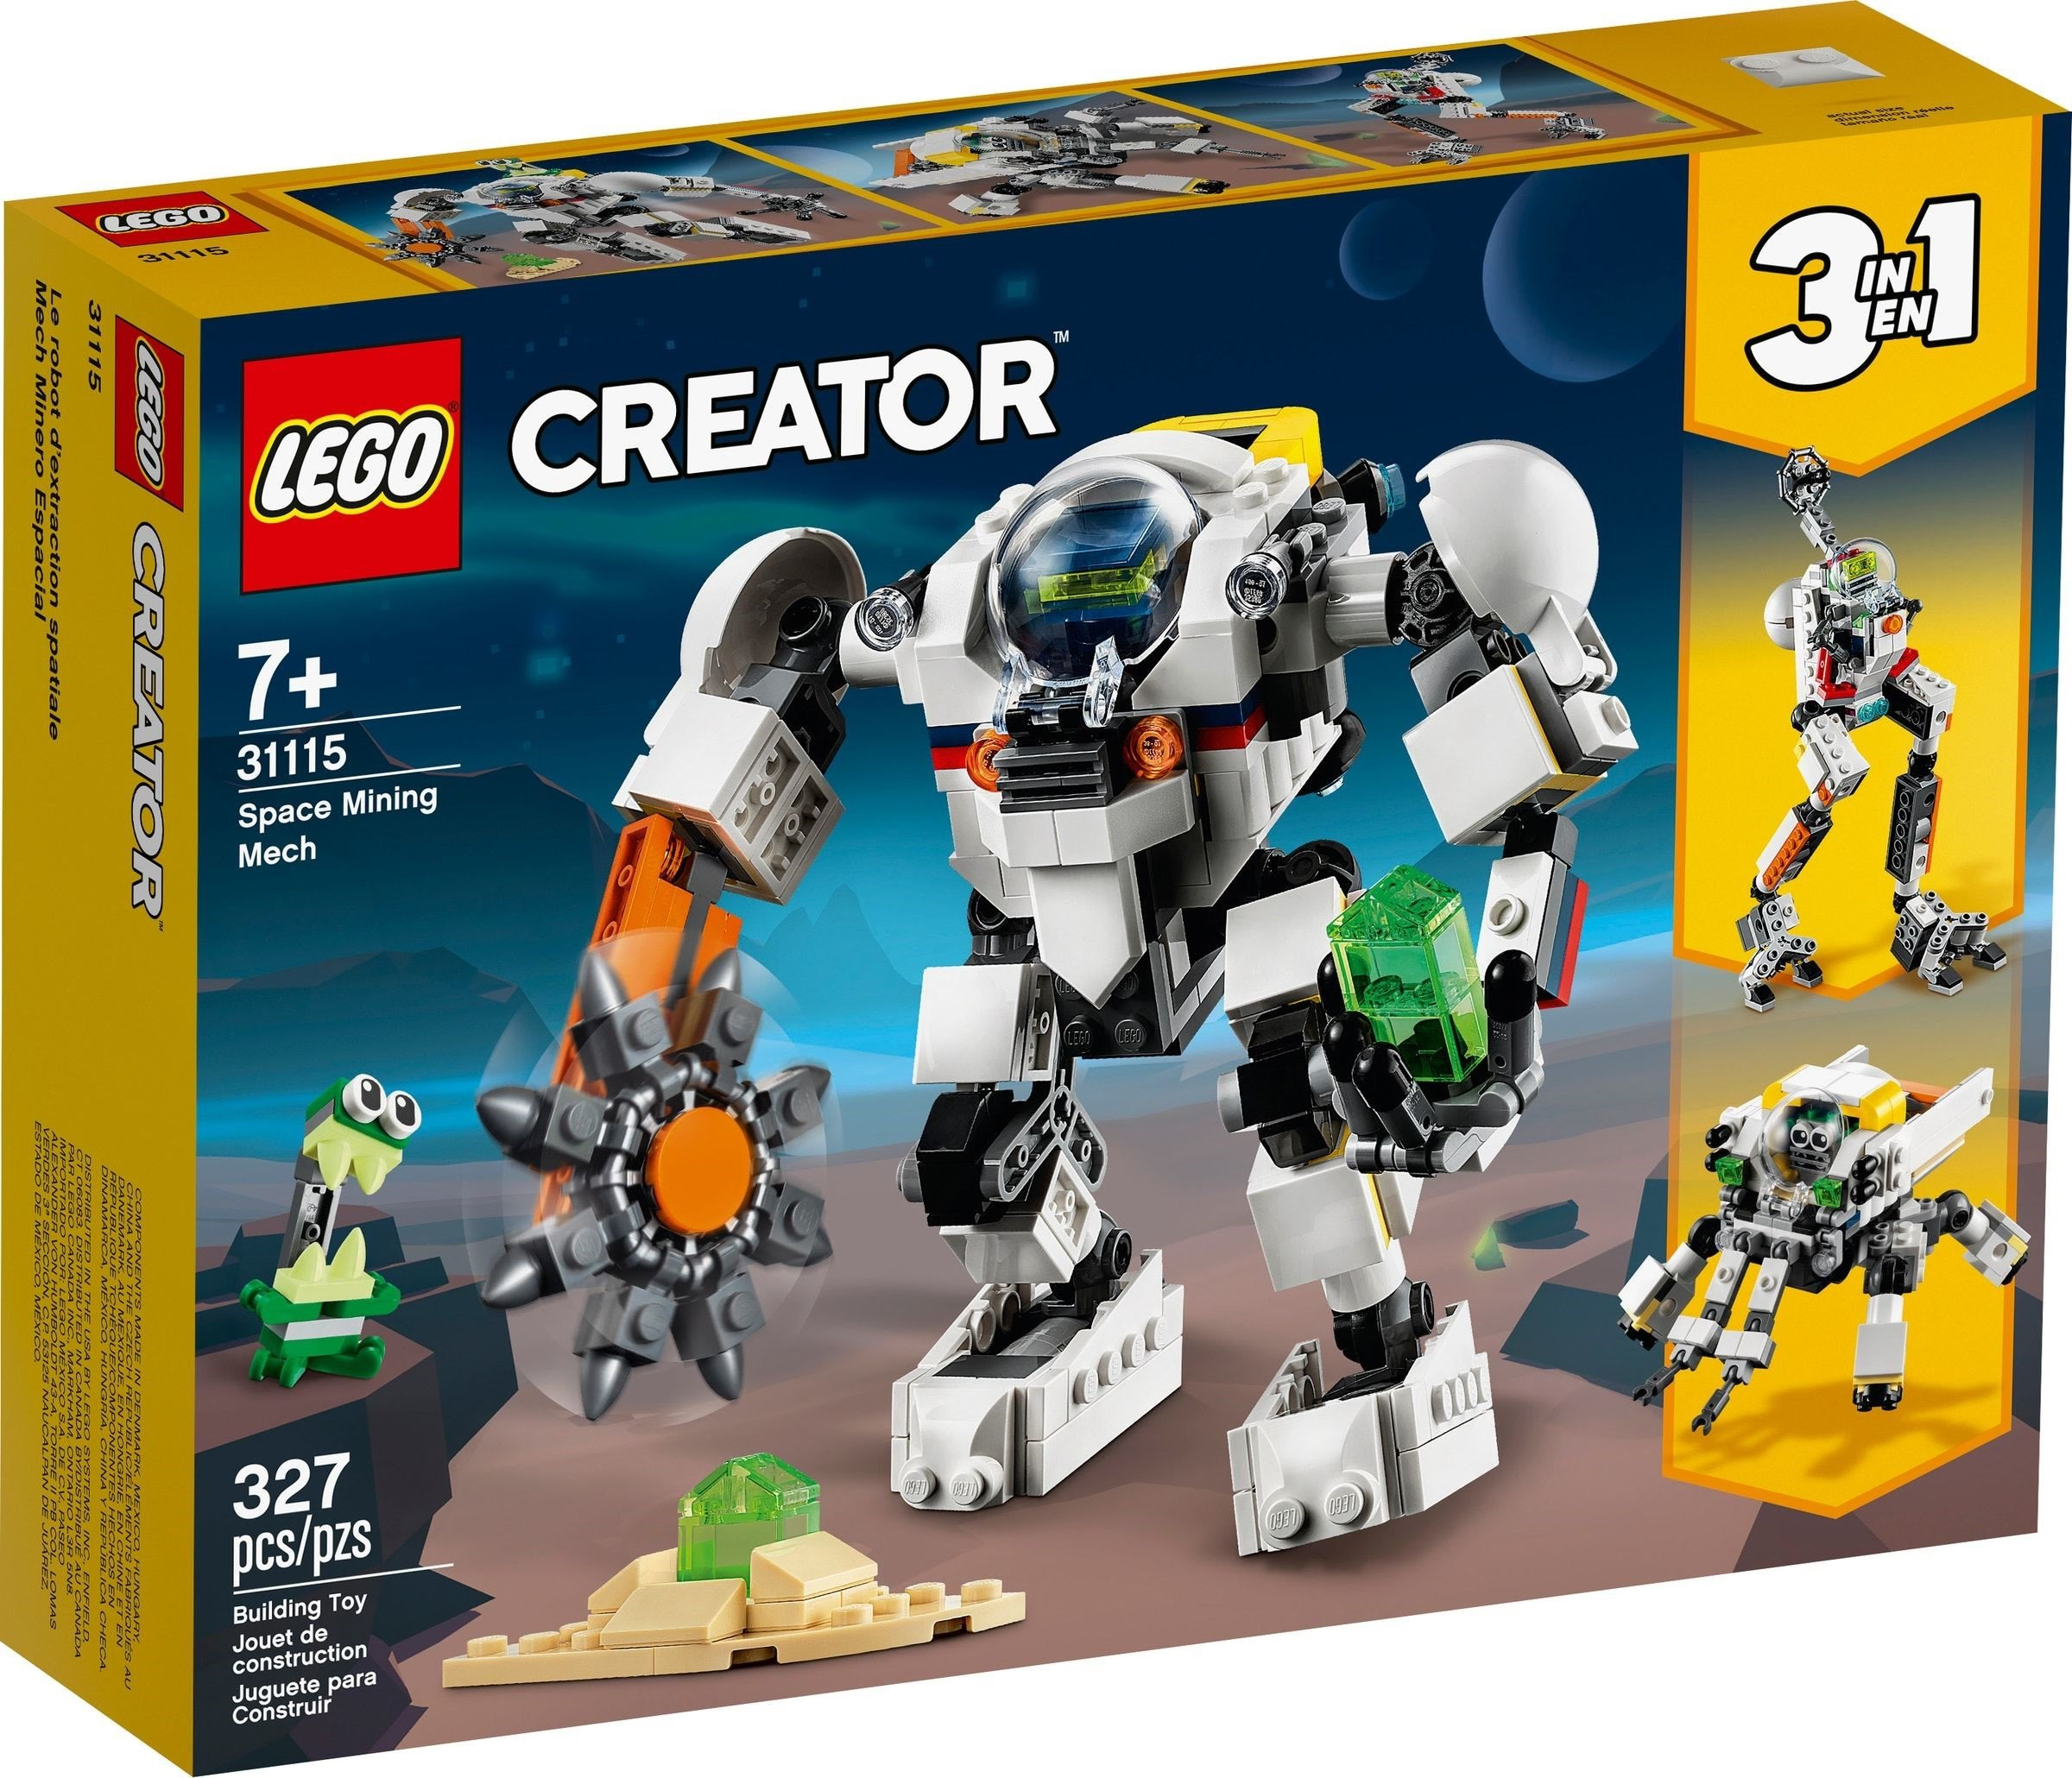 LEGO Creator - Space Mining Mech (31115)